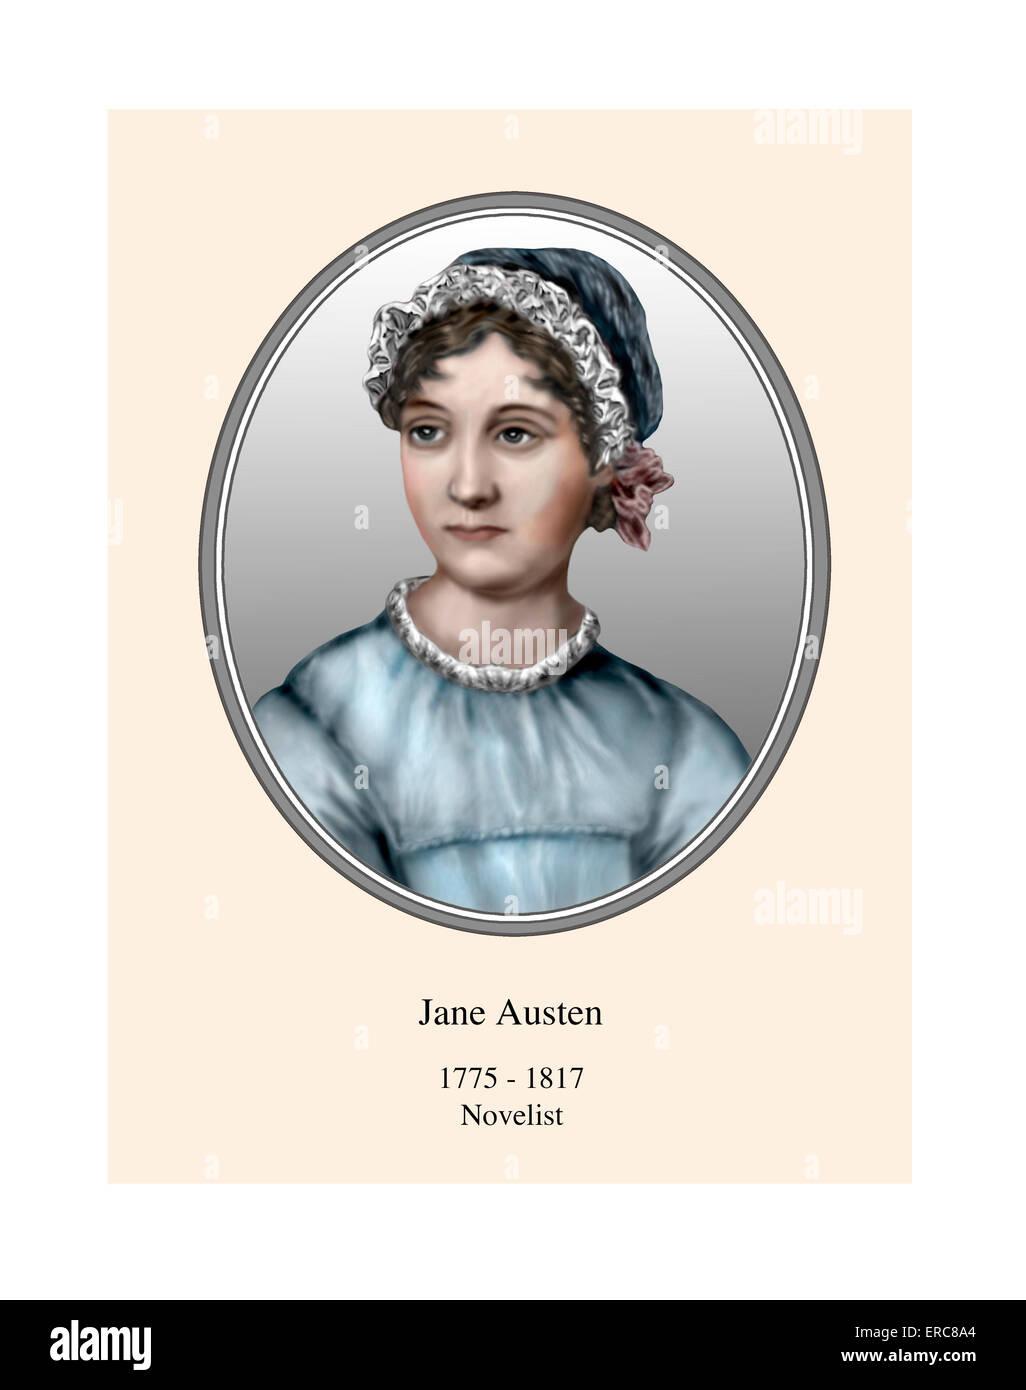 Jane Austen retrato ILUSTRACIÓN MODERNA Imagen De Stock